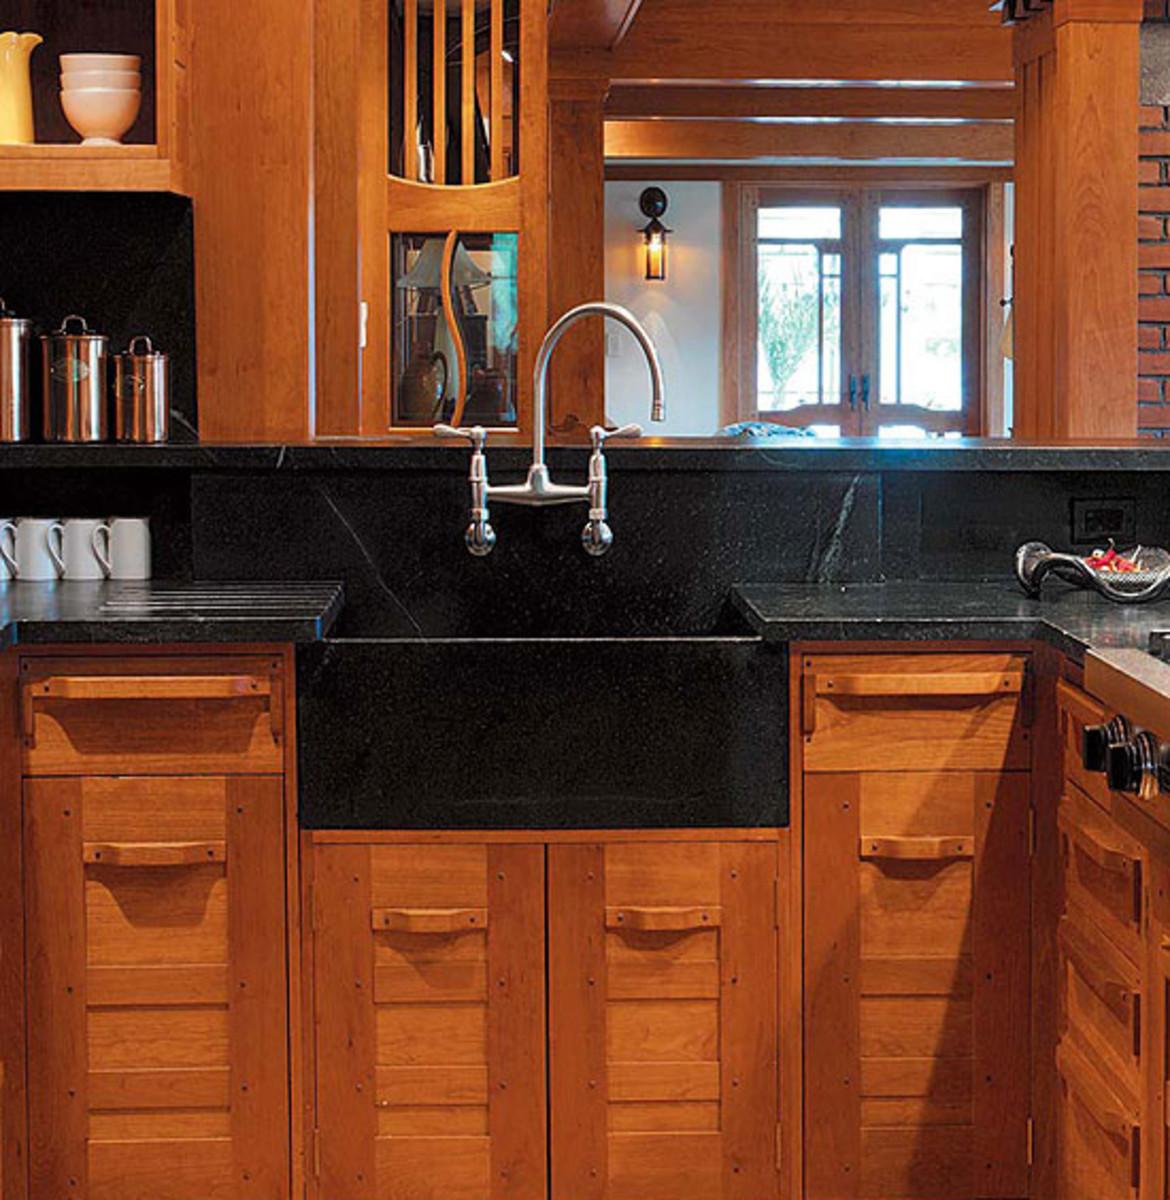 Kitchen Sinks & Countertops: Go Trendy or Timeless? - Arts ... on Black Countertops With Black Backsplash  id=55258